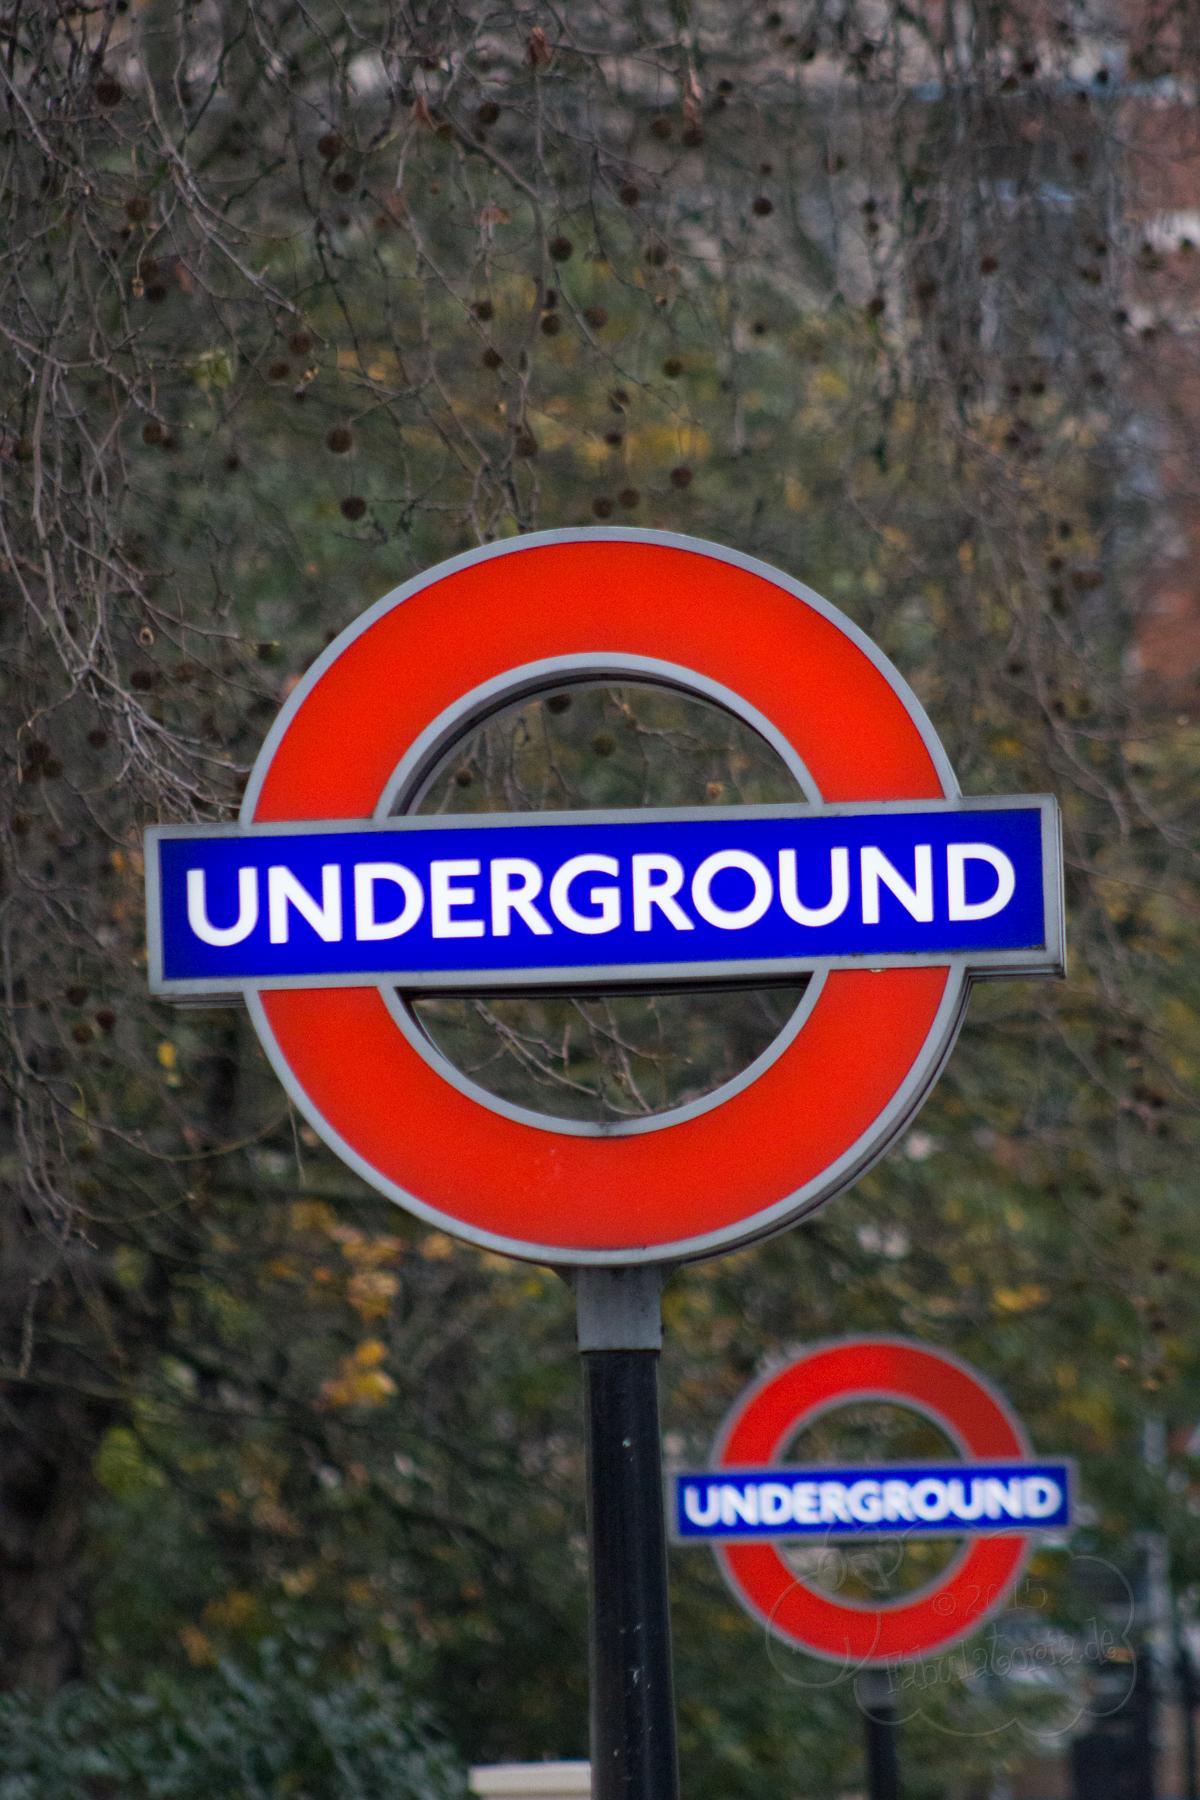 #BlogowskiLondonJourney - London Underground